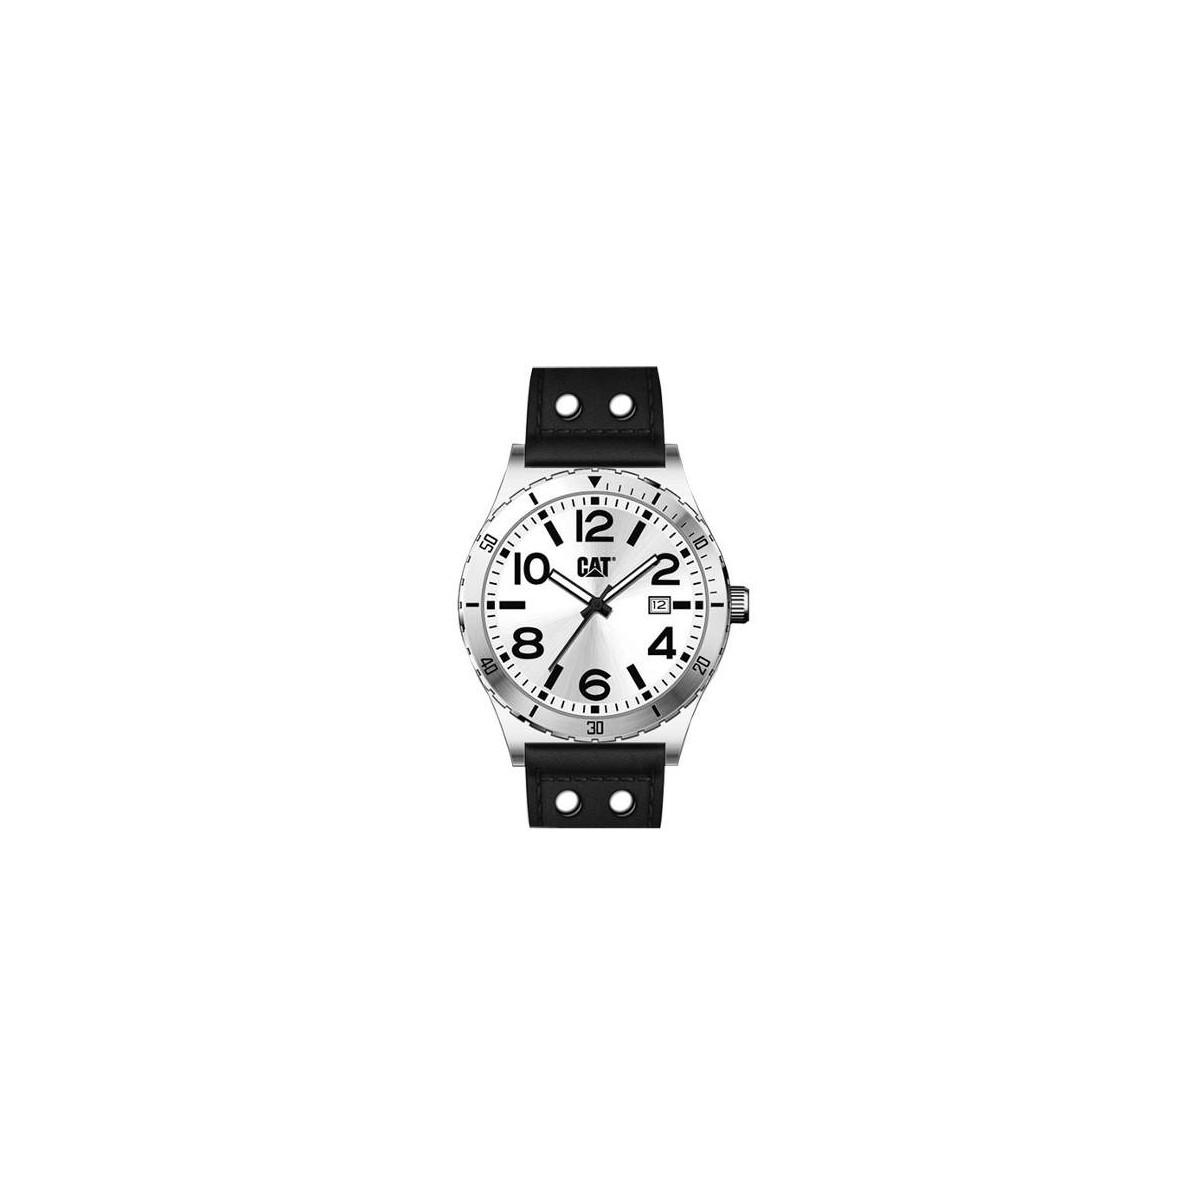 https://www.gaberjoyeria.com/3750-thickbox_default/reloj-cat-ni-241-34-231.jpg